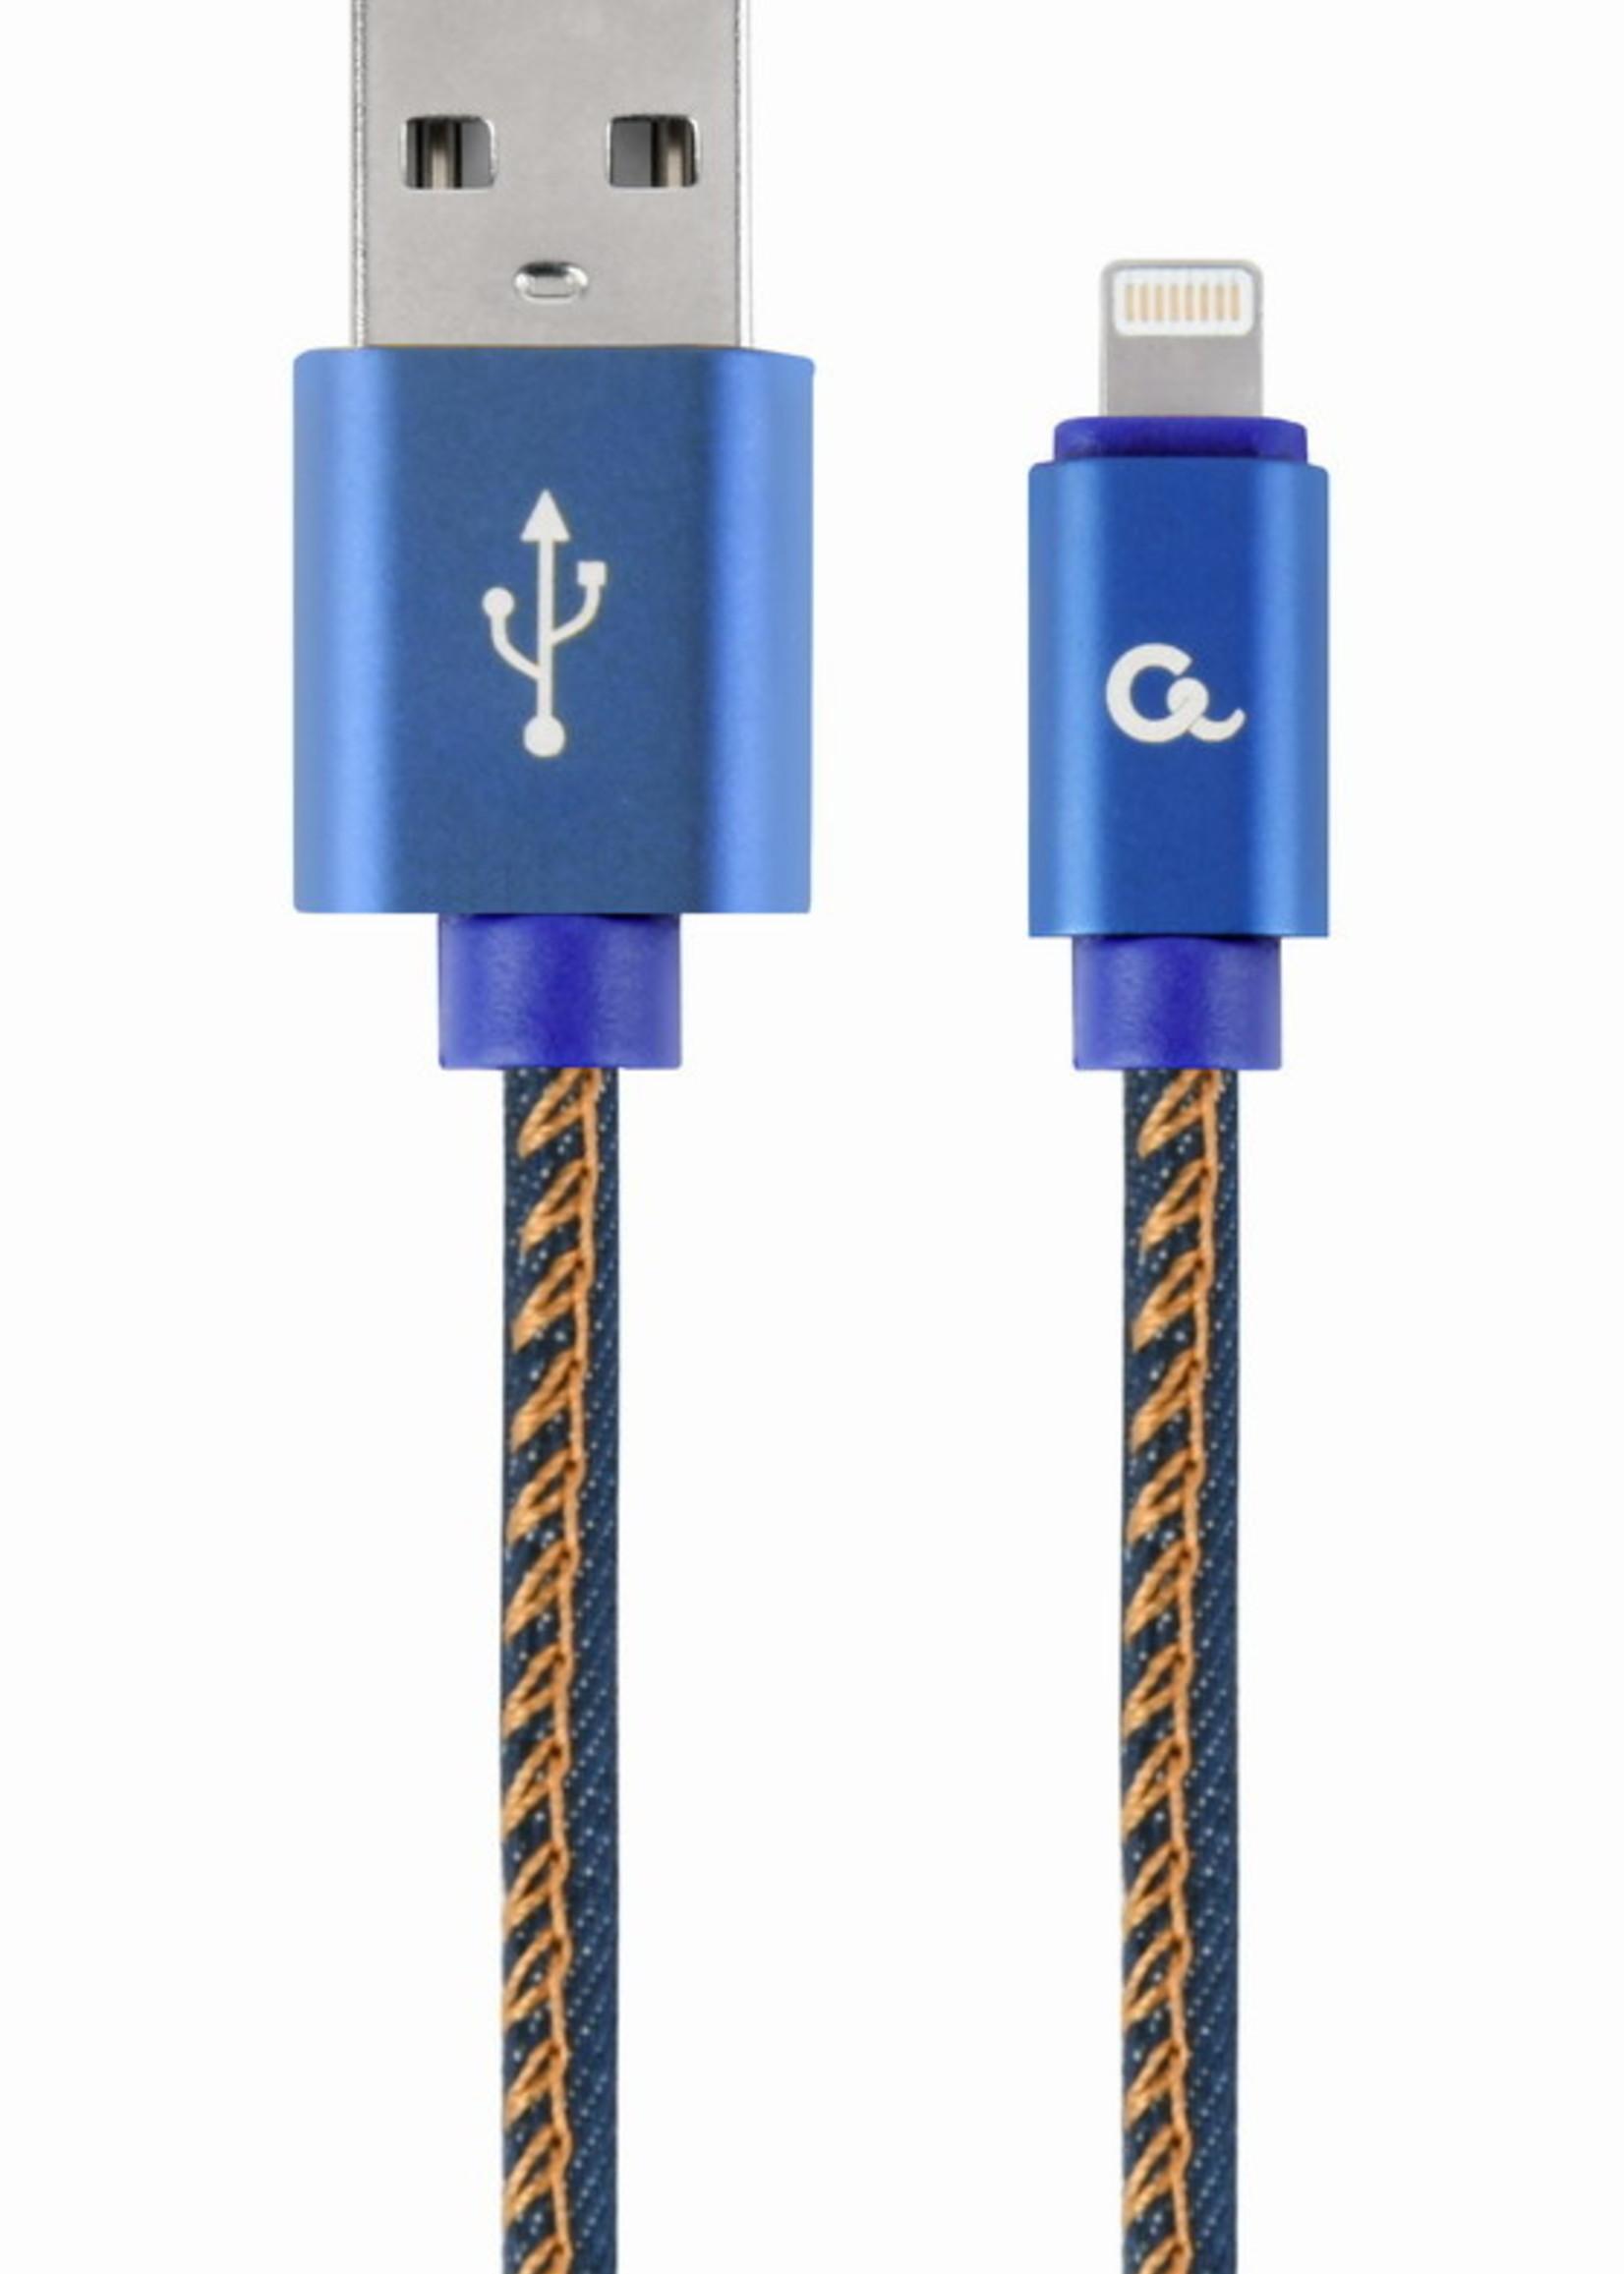 CableXpert 8-Pin kabel Denim Blue Jeans 1 meter